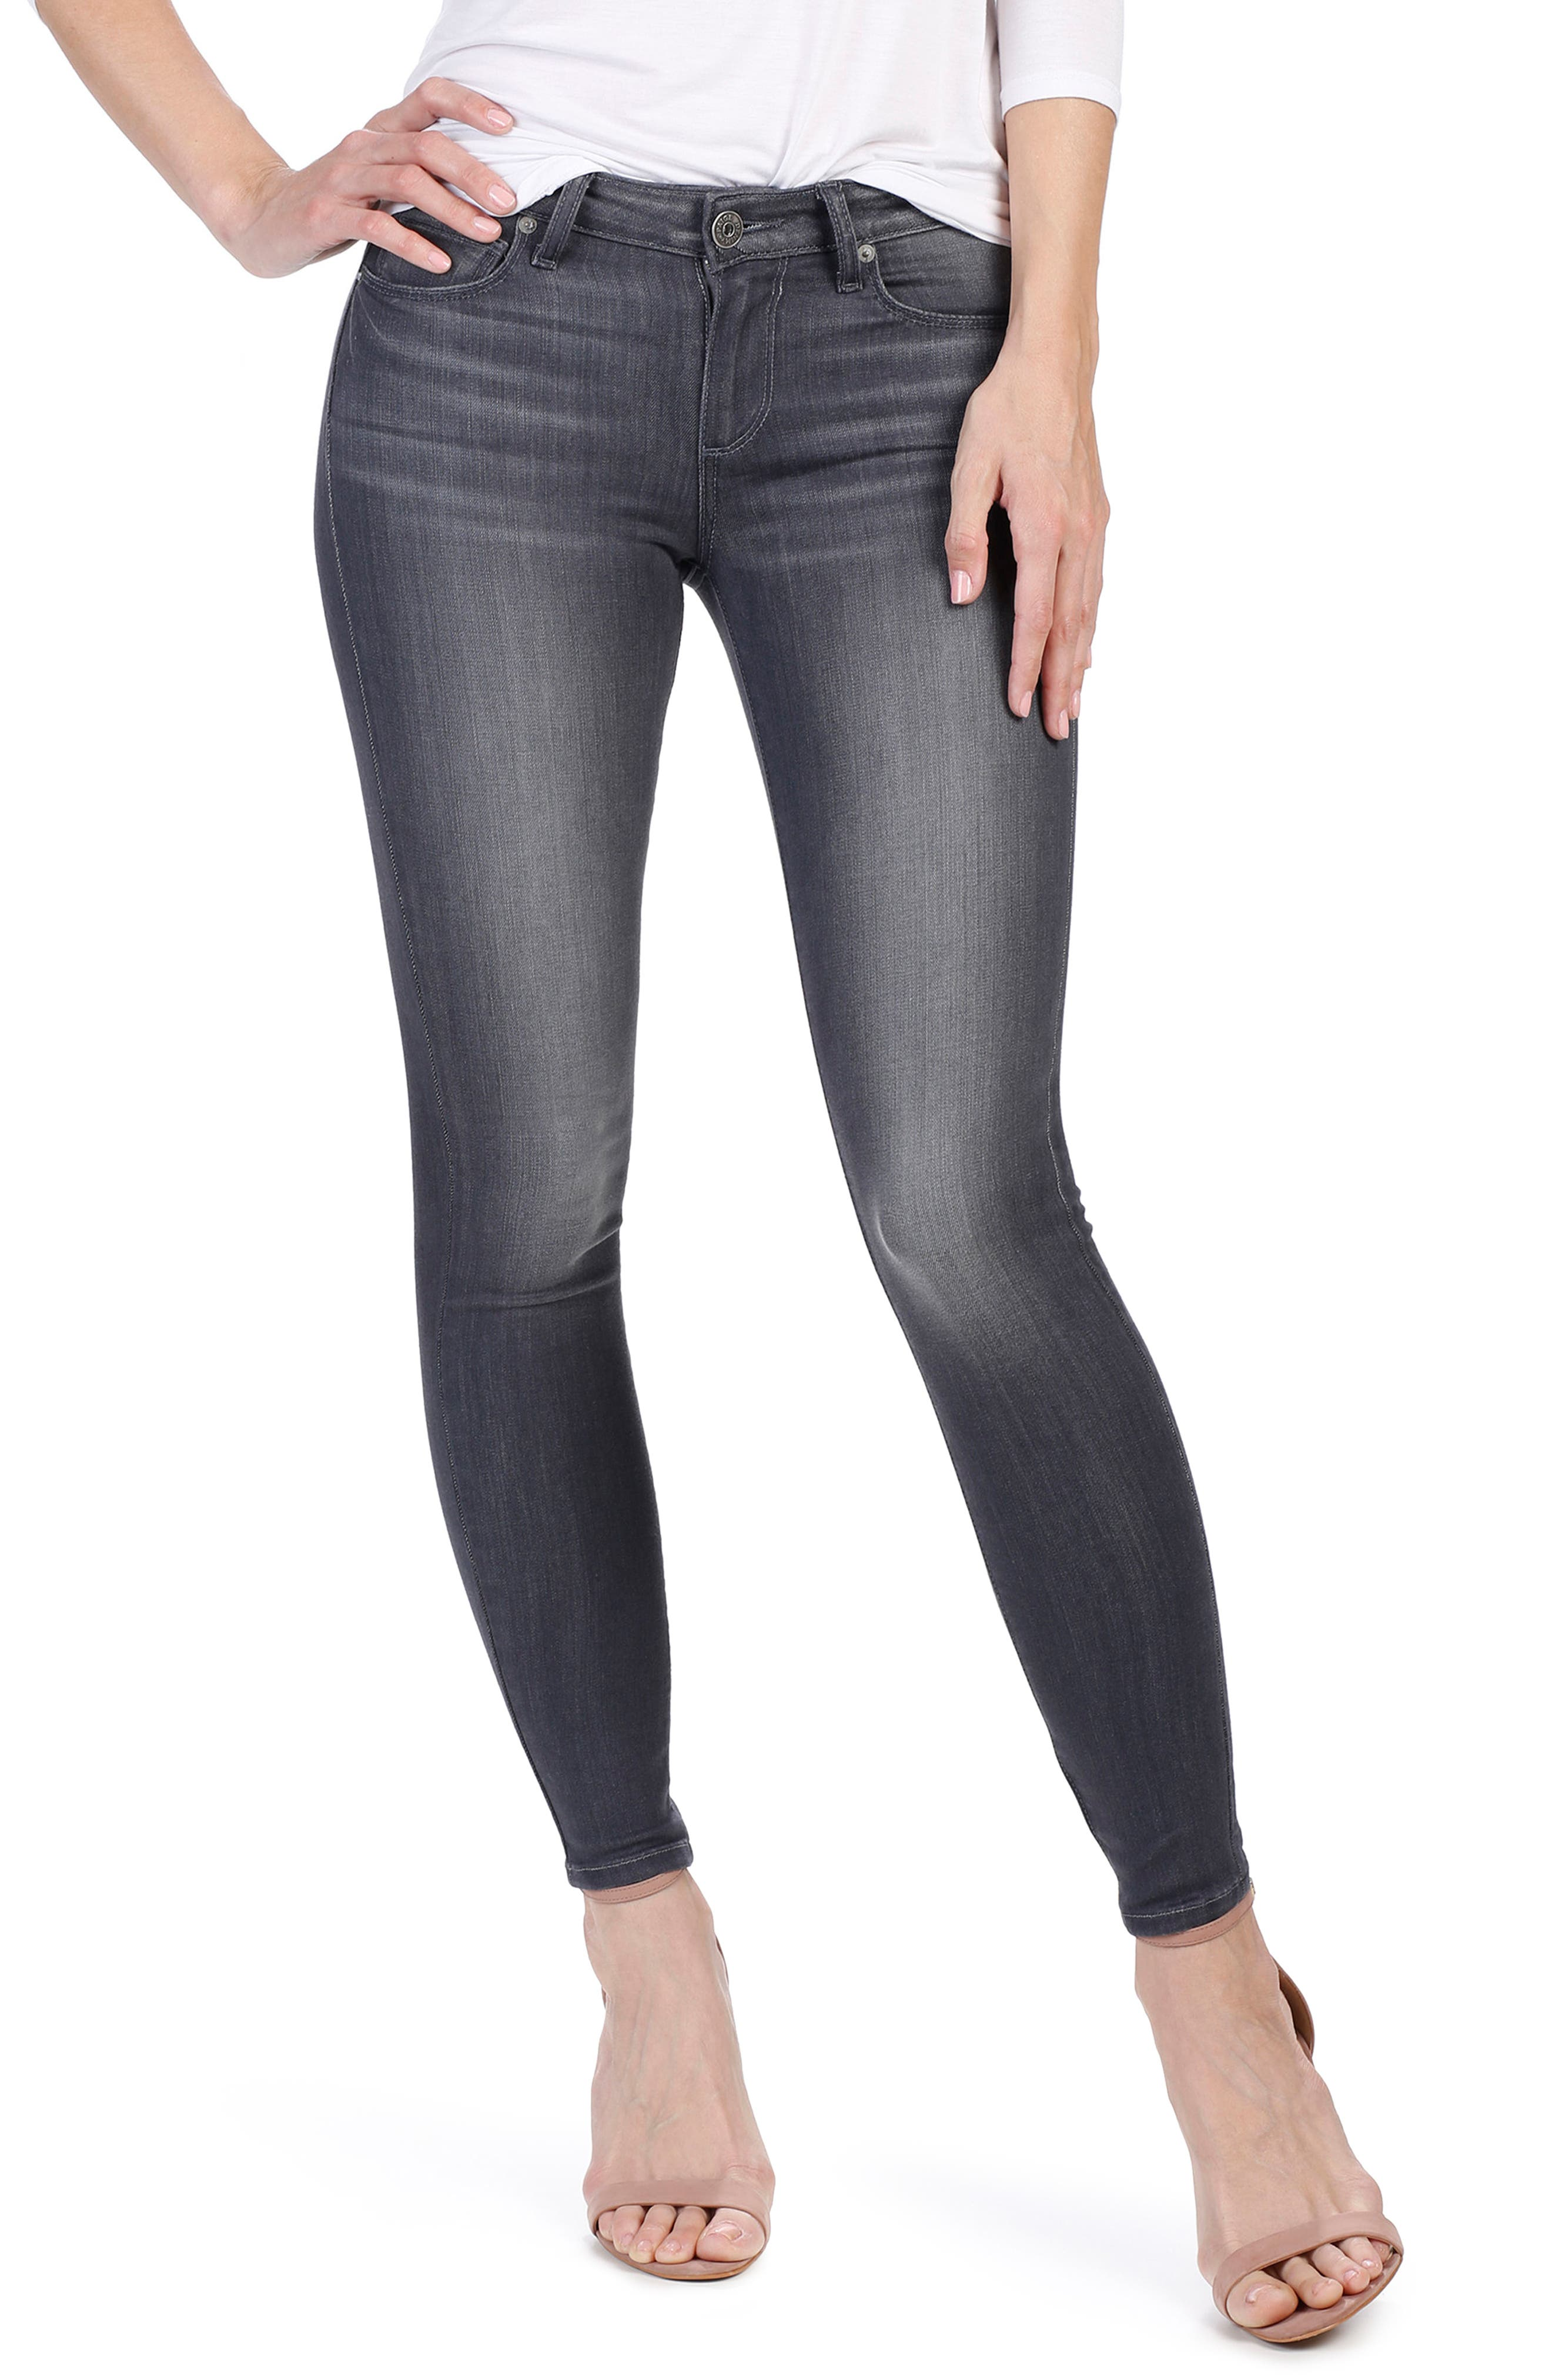 Transcend - Verdugo Ankle Skinny Jeans,                             Main thumbnail 1, color,                             020